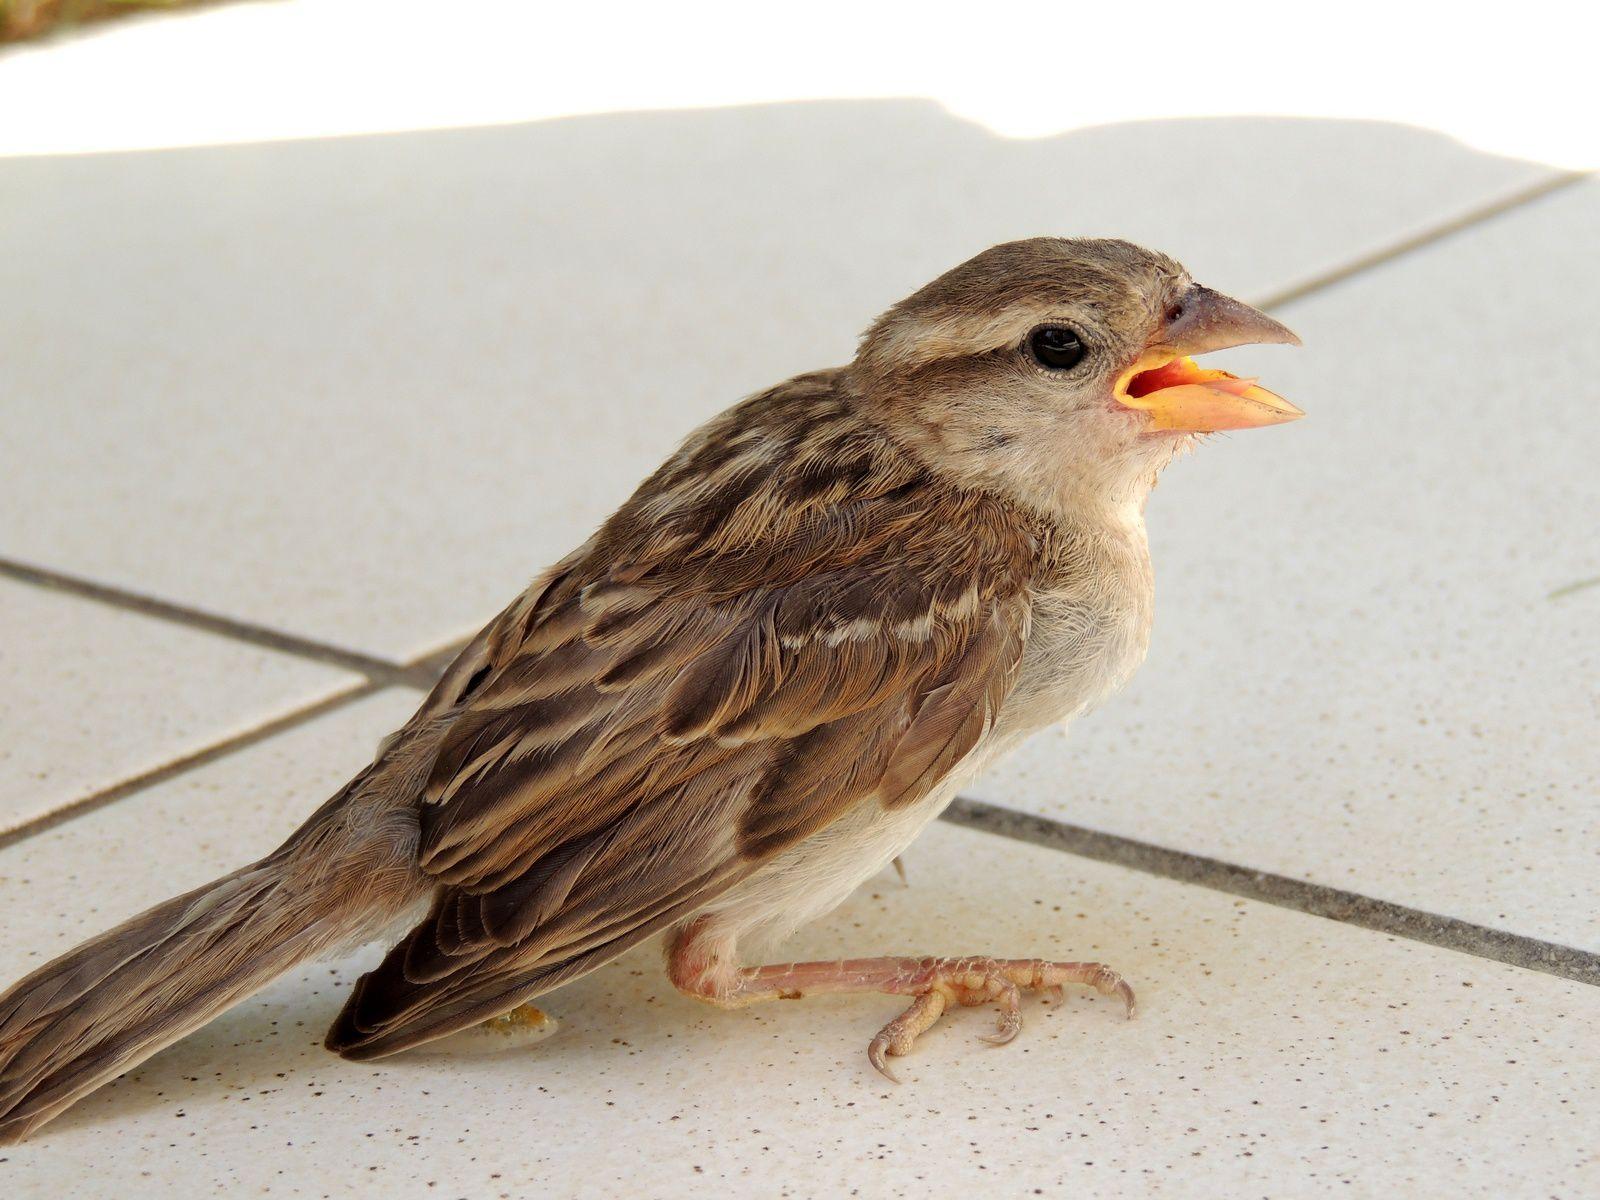 pauvre petit oiseau - poor little bird